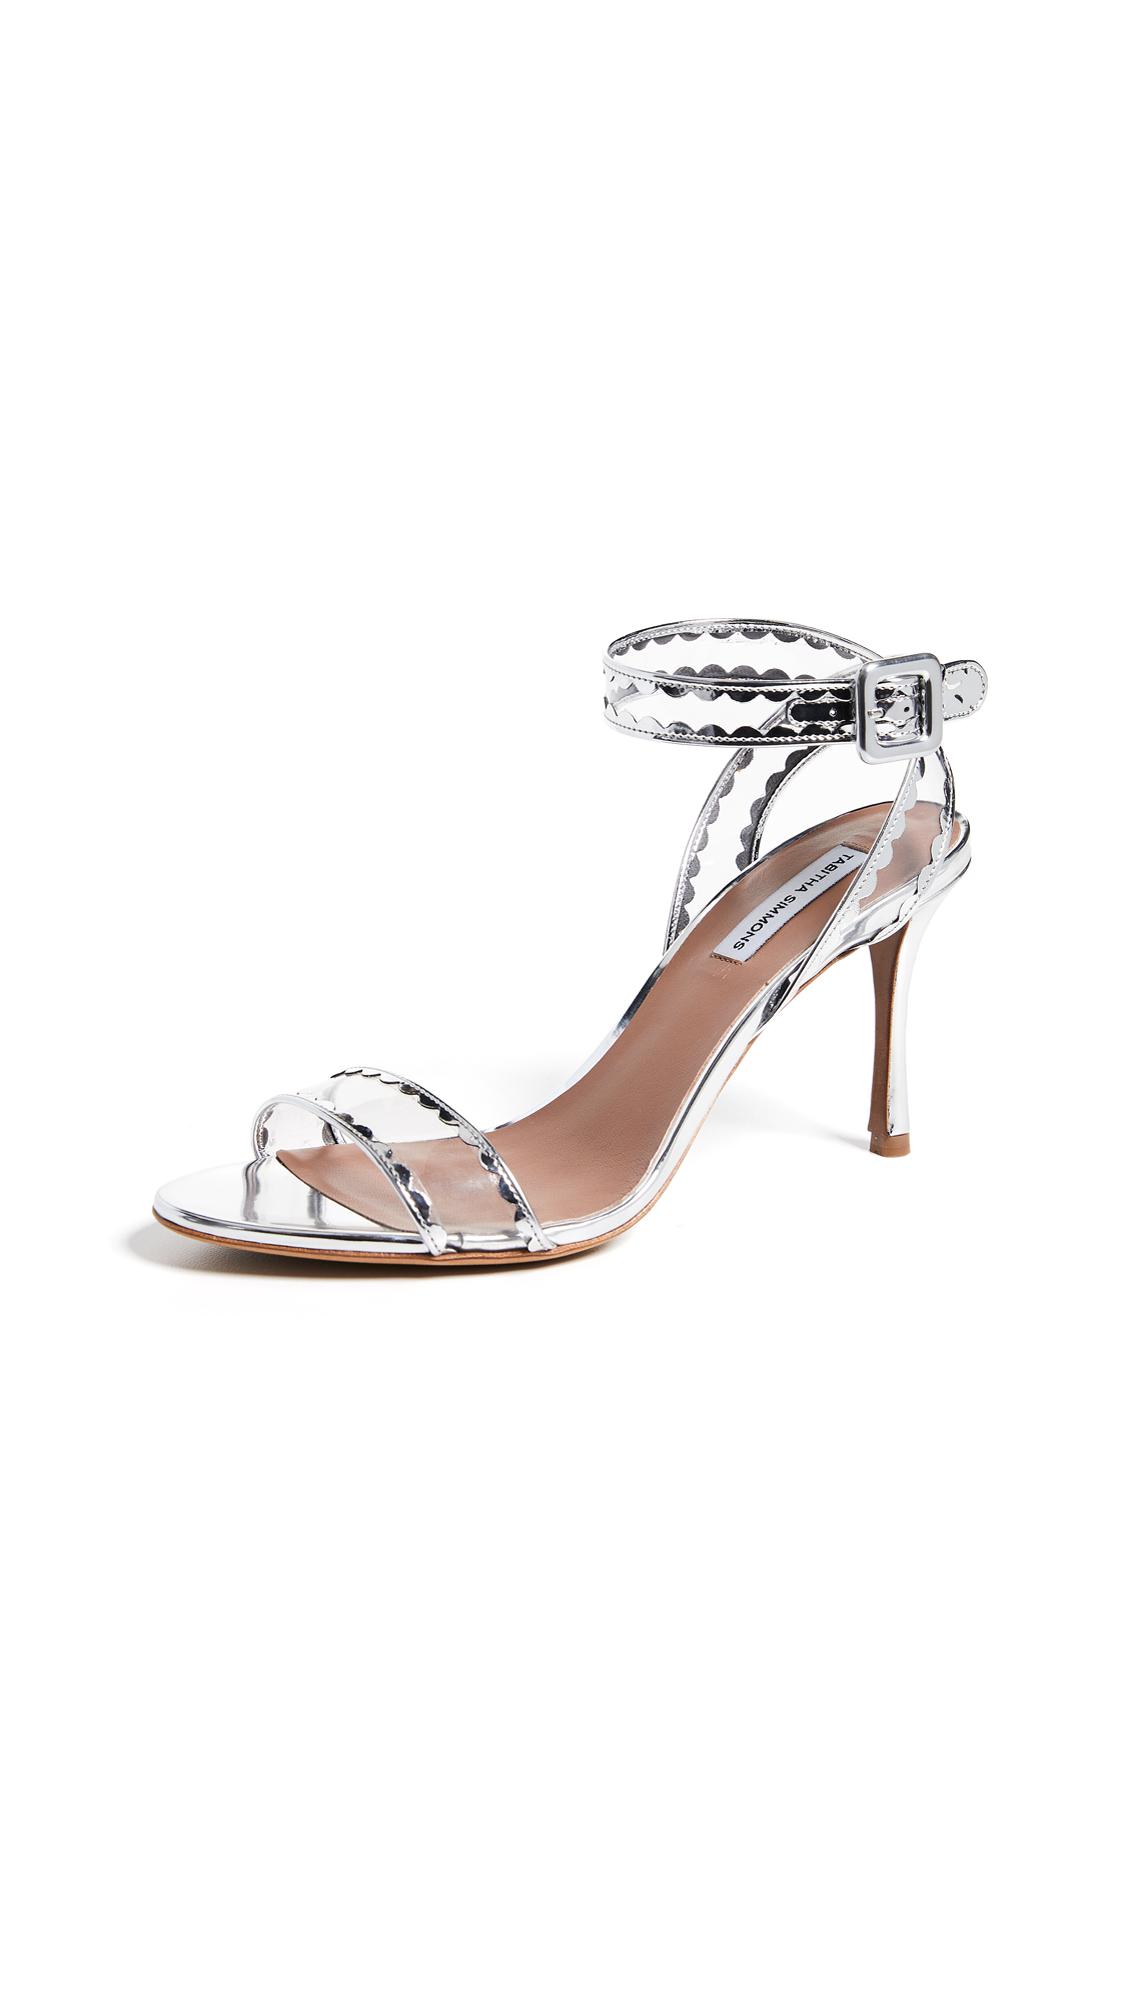 Tabitha Simmons Lissa Frill Heels - Silver